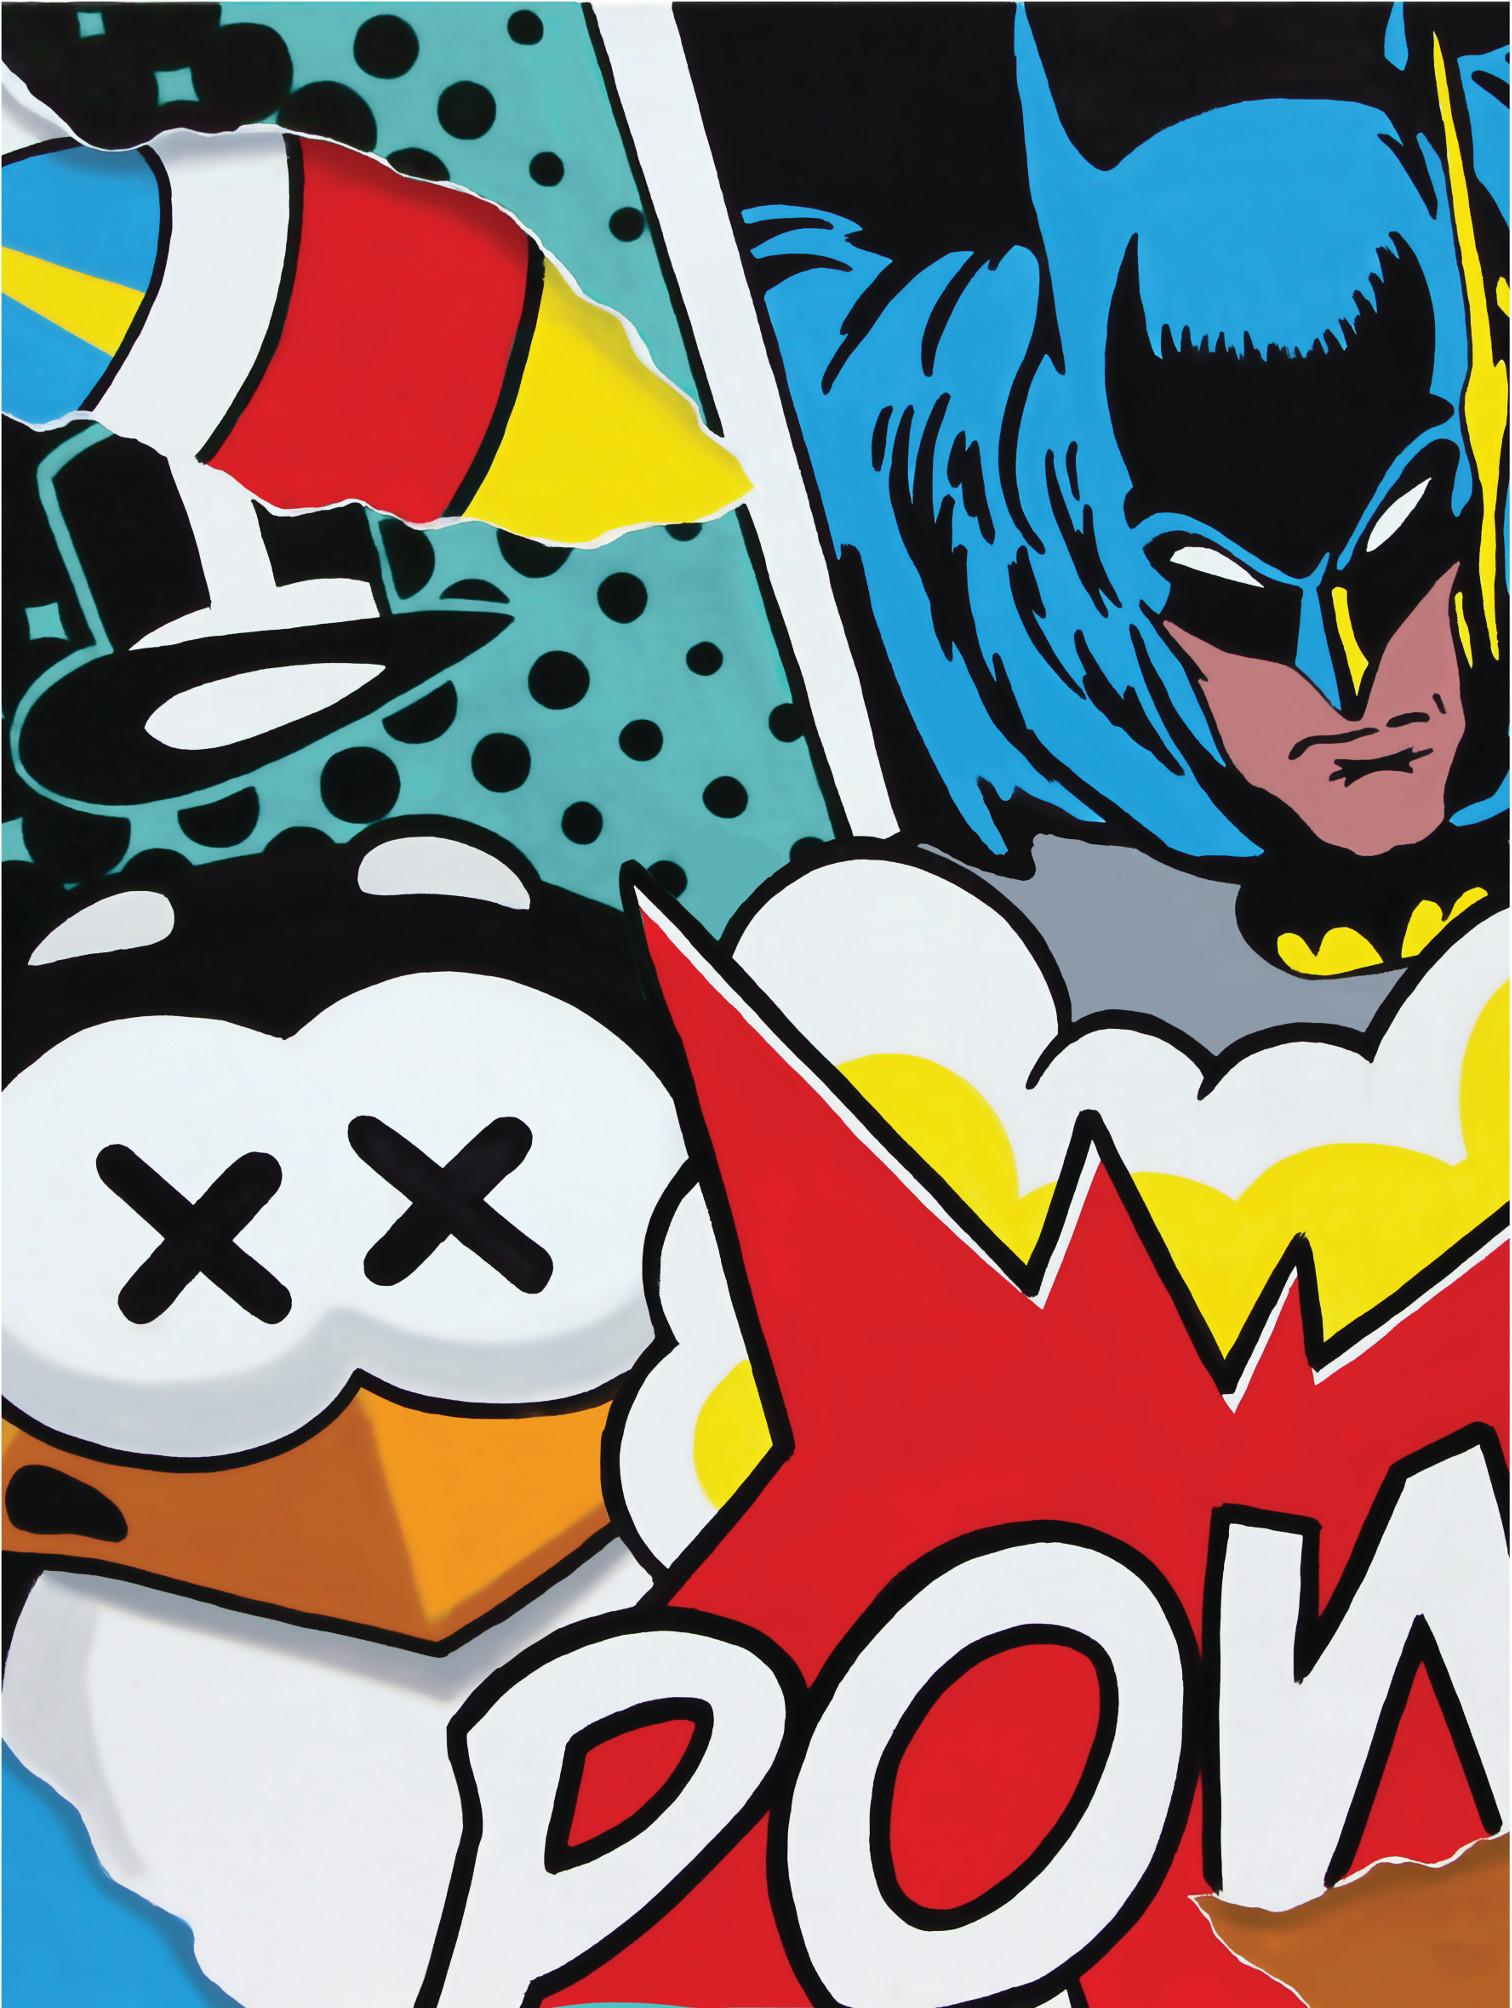 pao_batman-vs-penguin_2017_serigrafia_tecnica-mista_cm-100x70